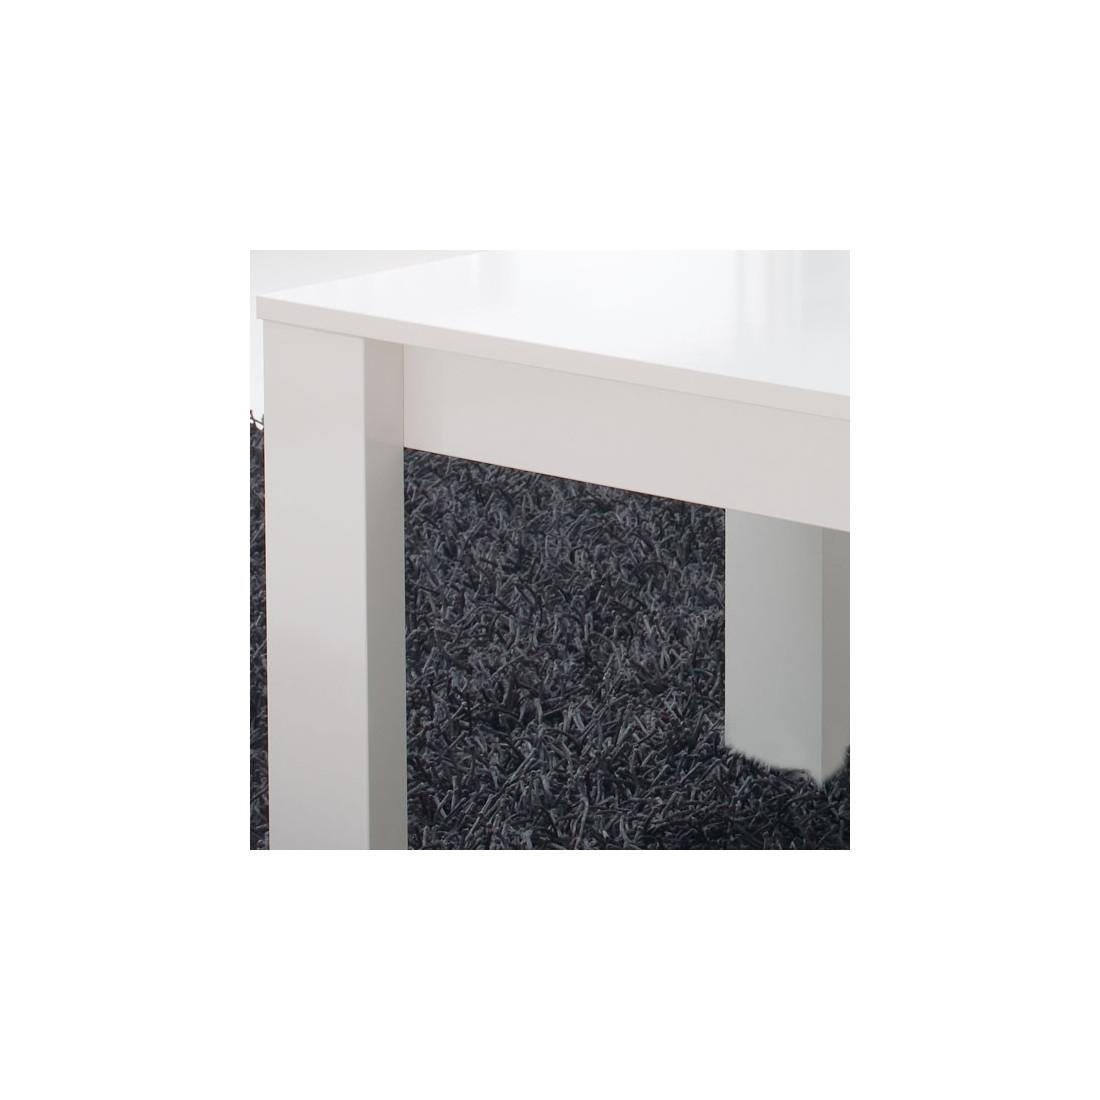 Table basse relevable blanche moderne n 1 malia univers - Table basse blanche relevable ...